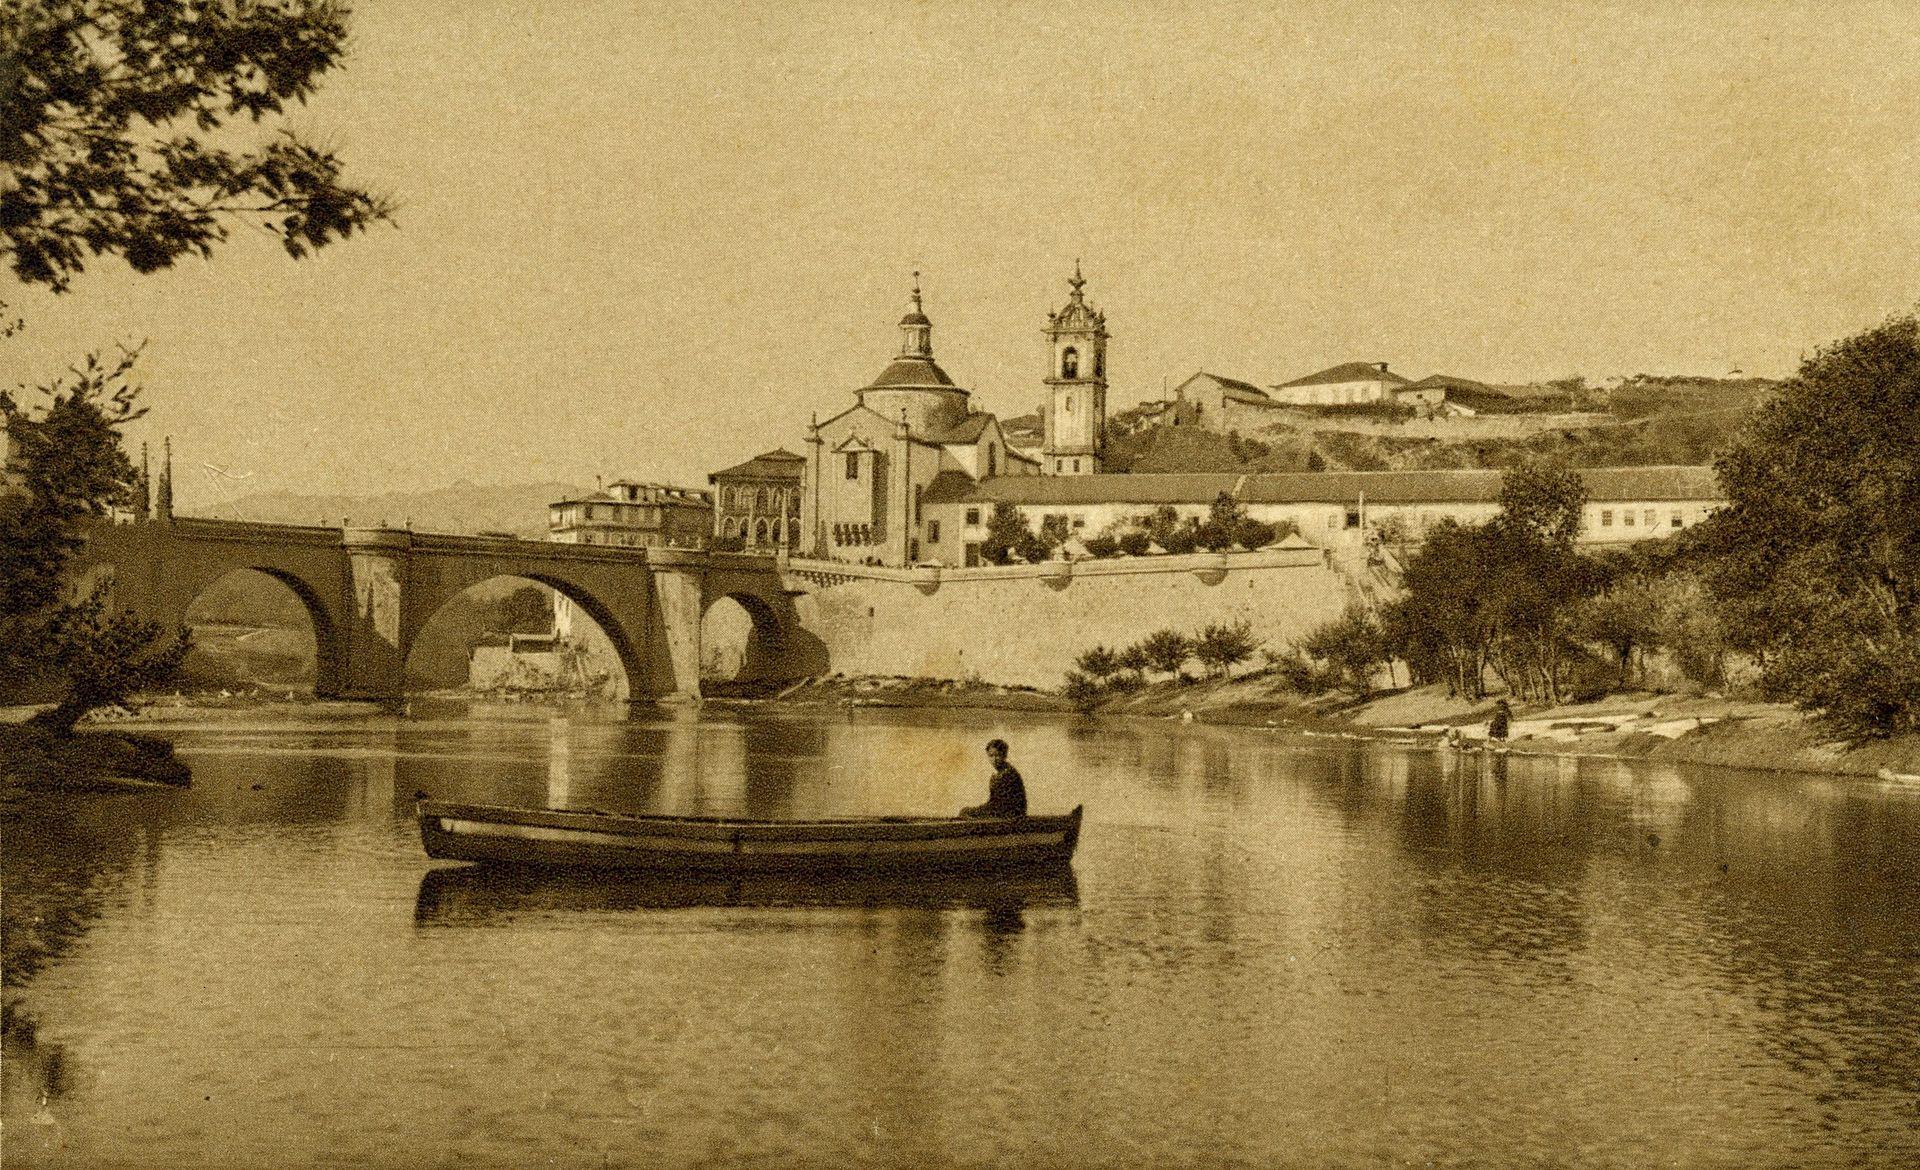 a view of the monastery and church 1910 Amarante,_trecho_do_rio_Tâmega.jpg